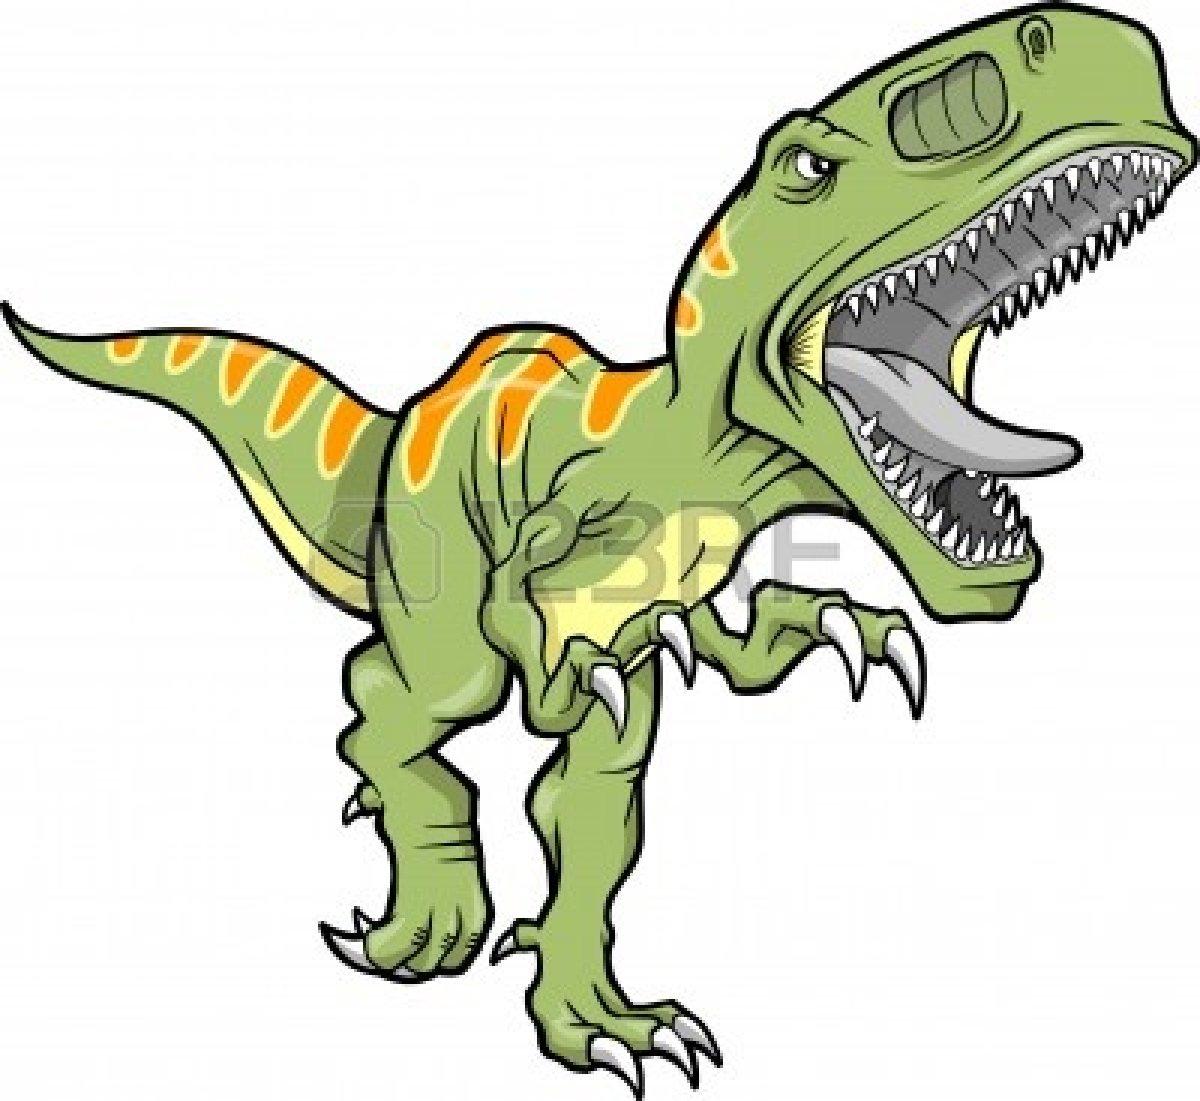 clipart of dinosaur - photo #31